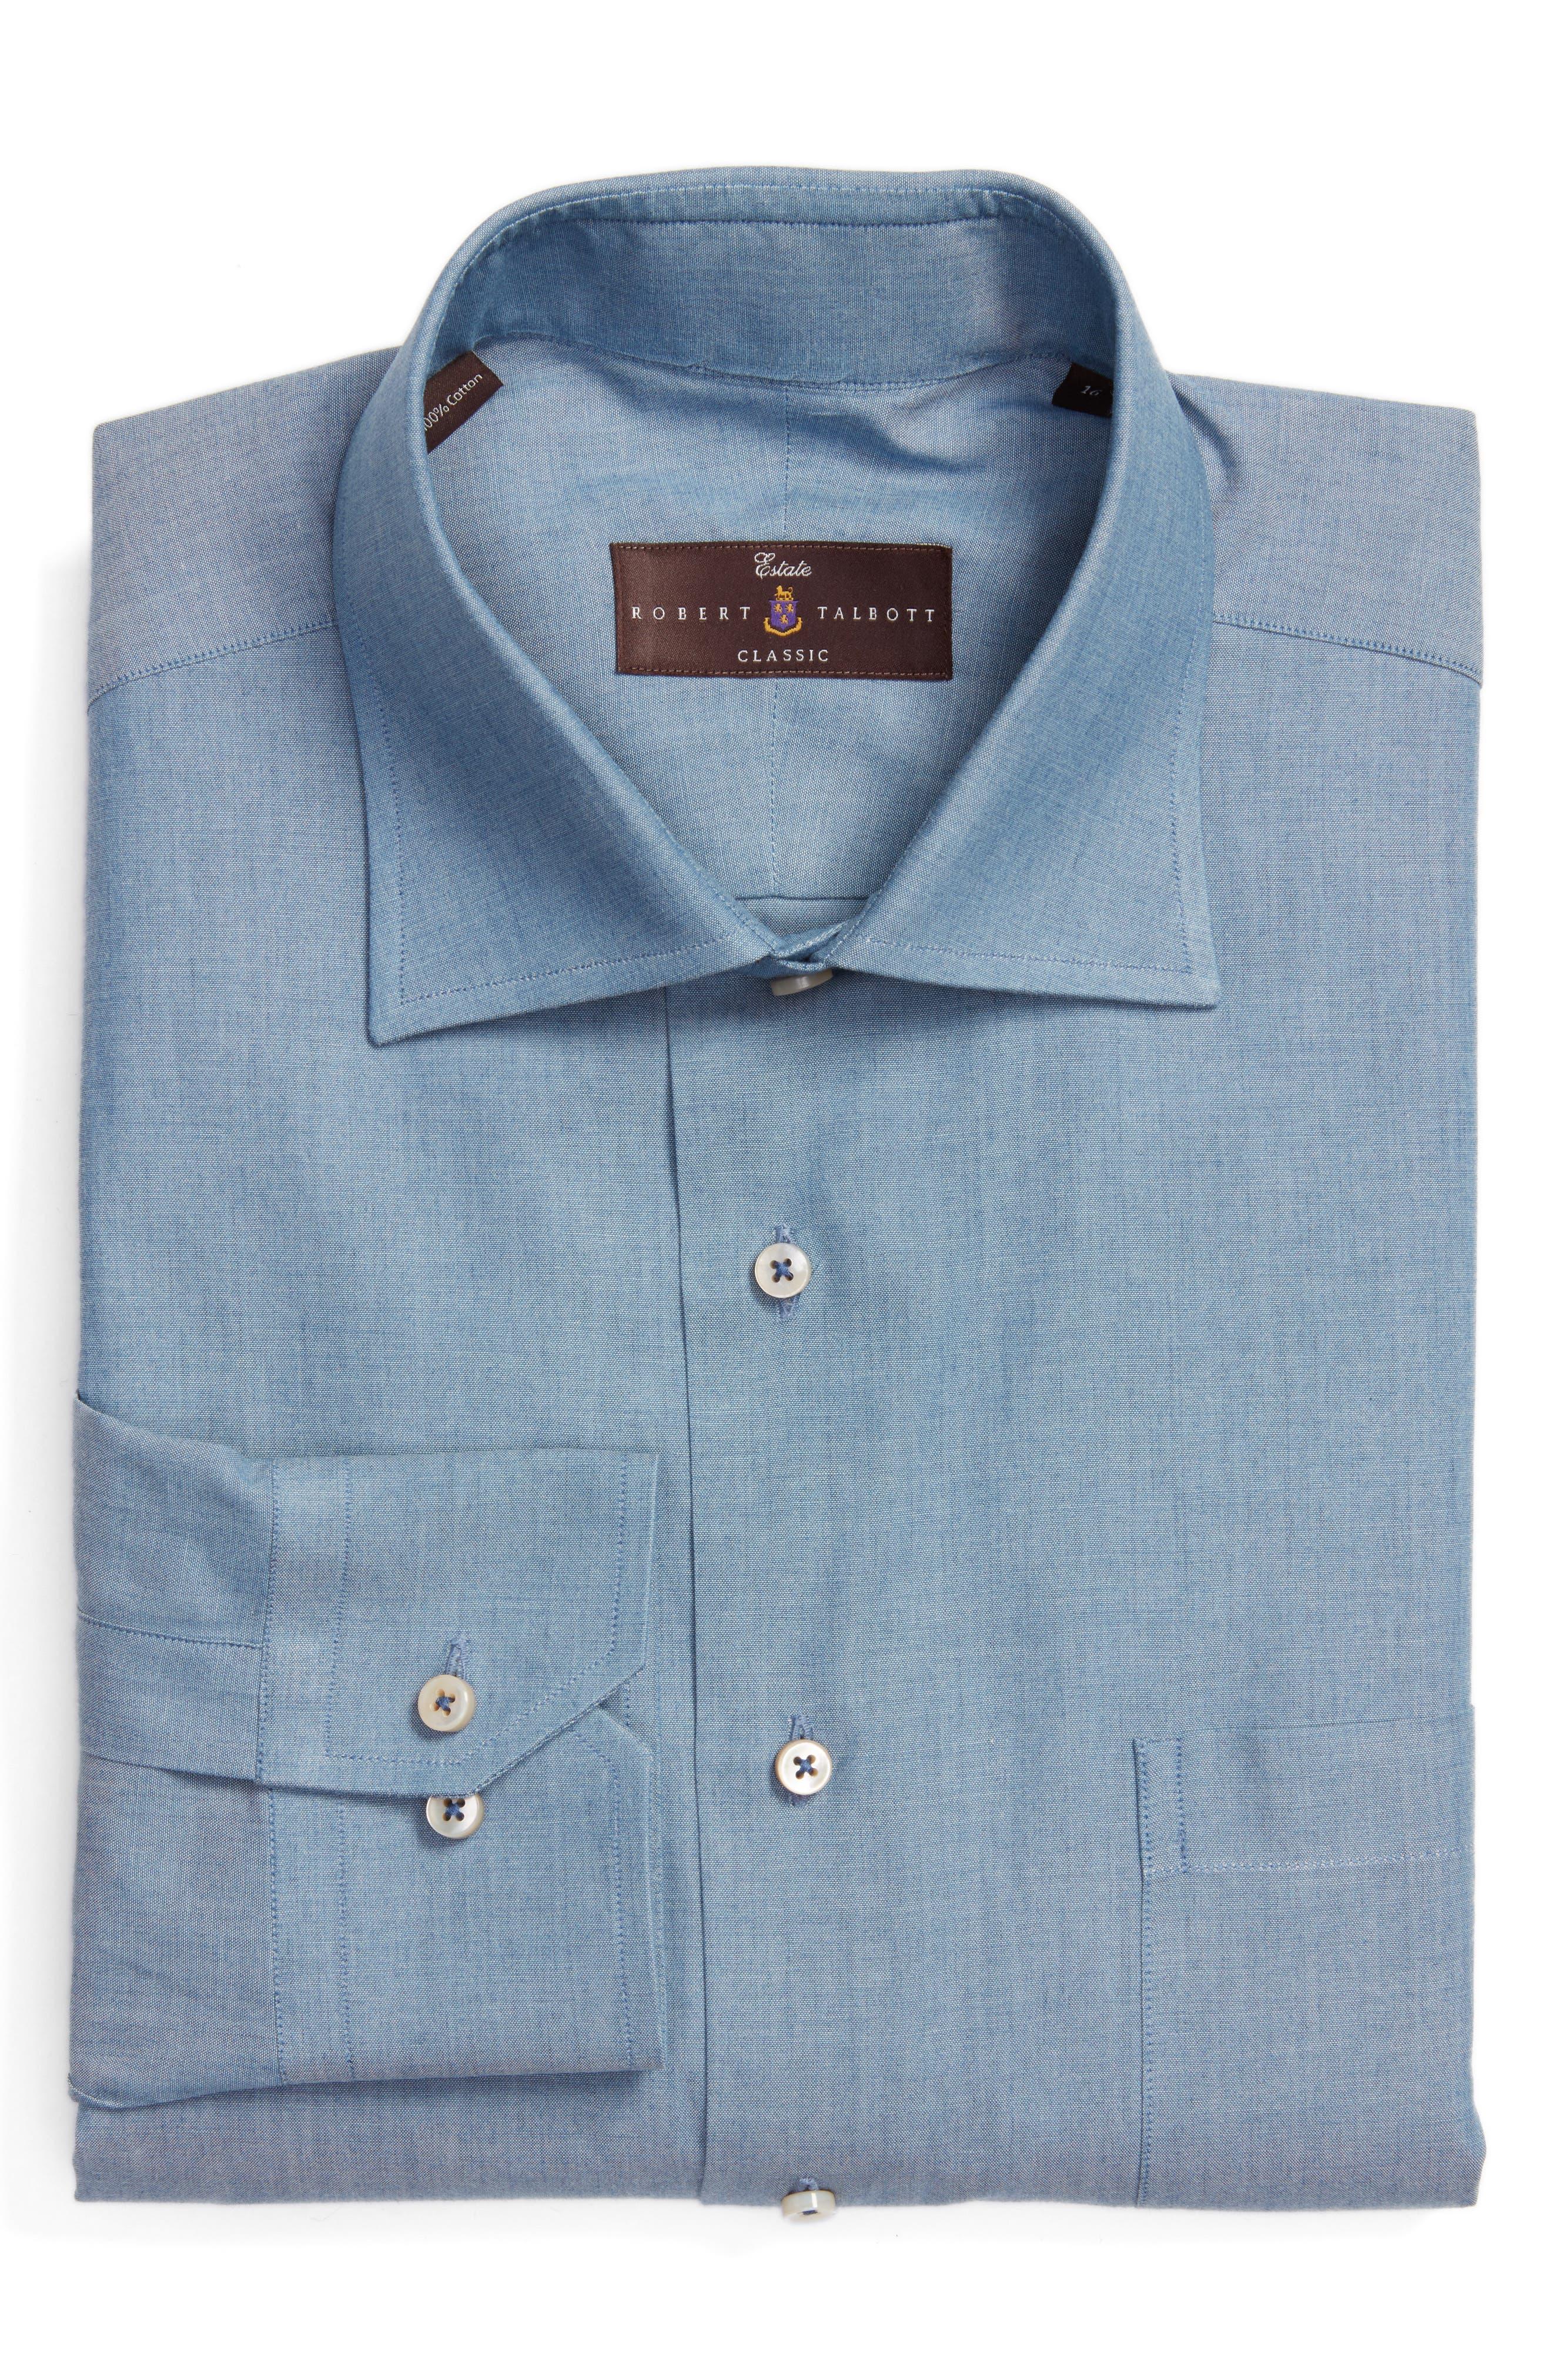 Main Image - Robert Talbott Classic Fit Oxford Dress Shirt